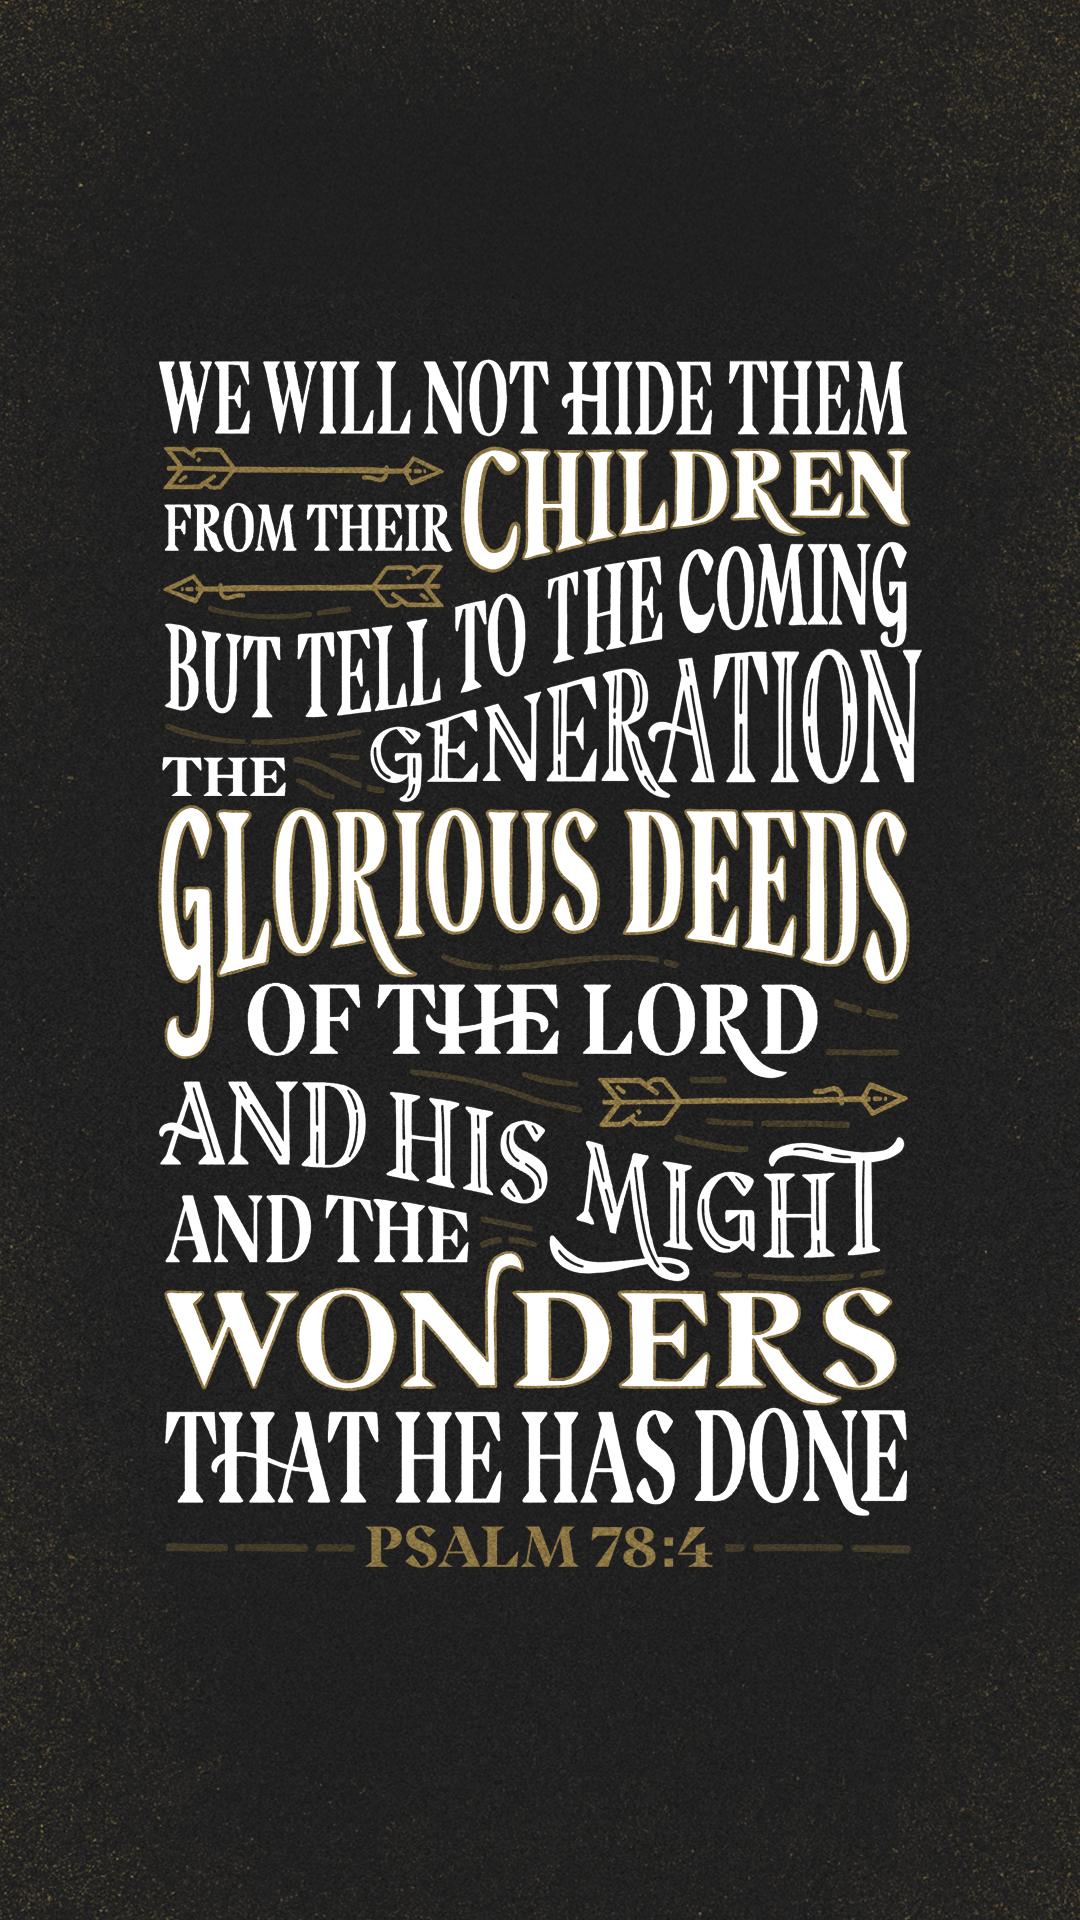 psalm-verse.jpg